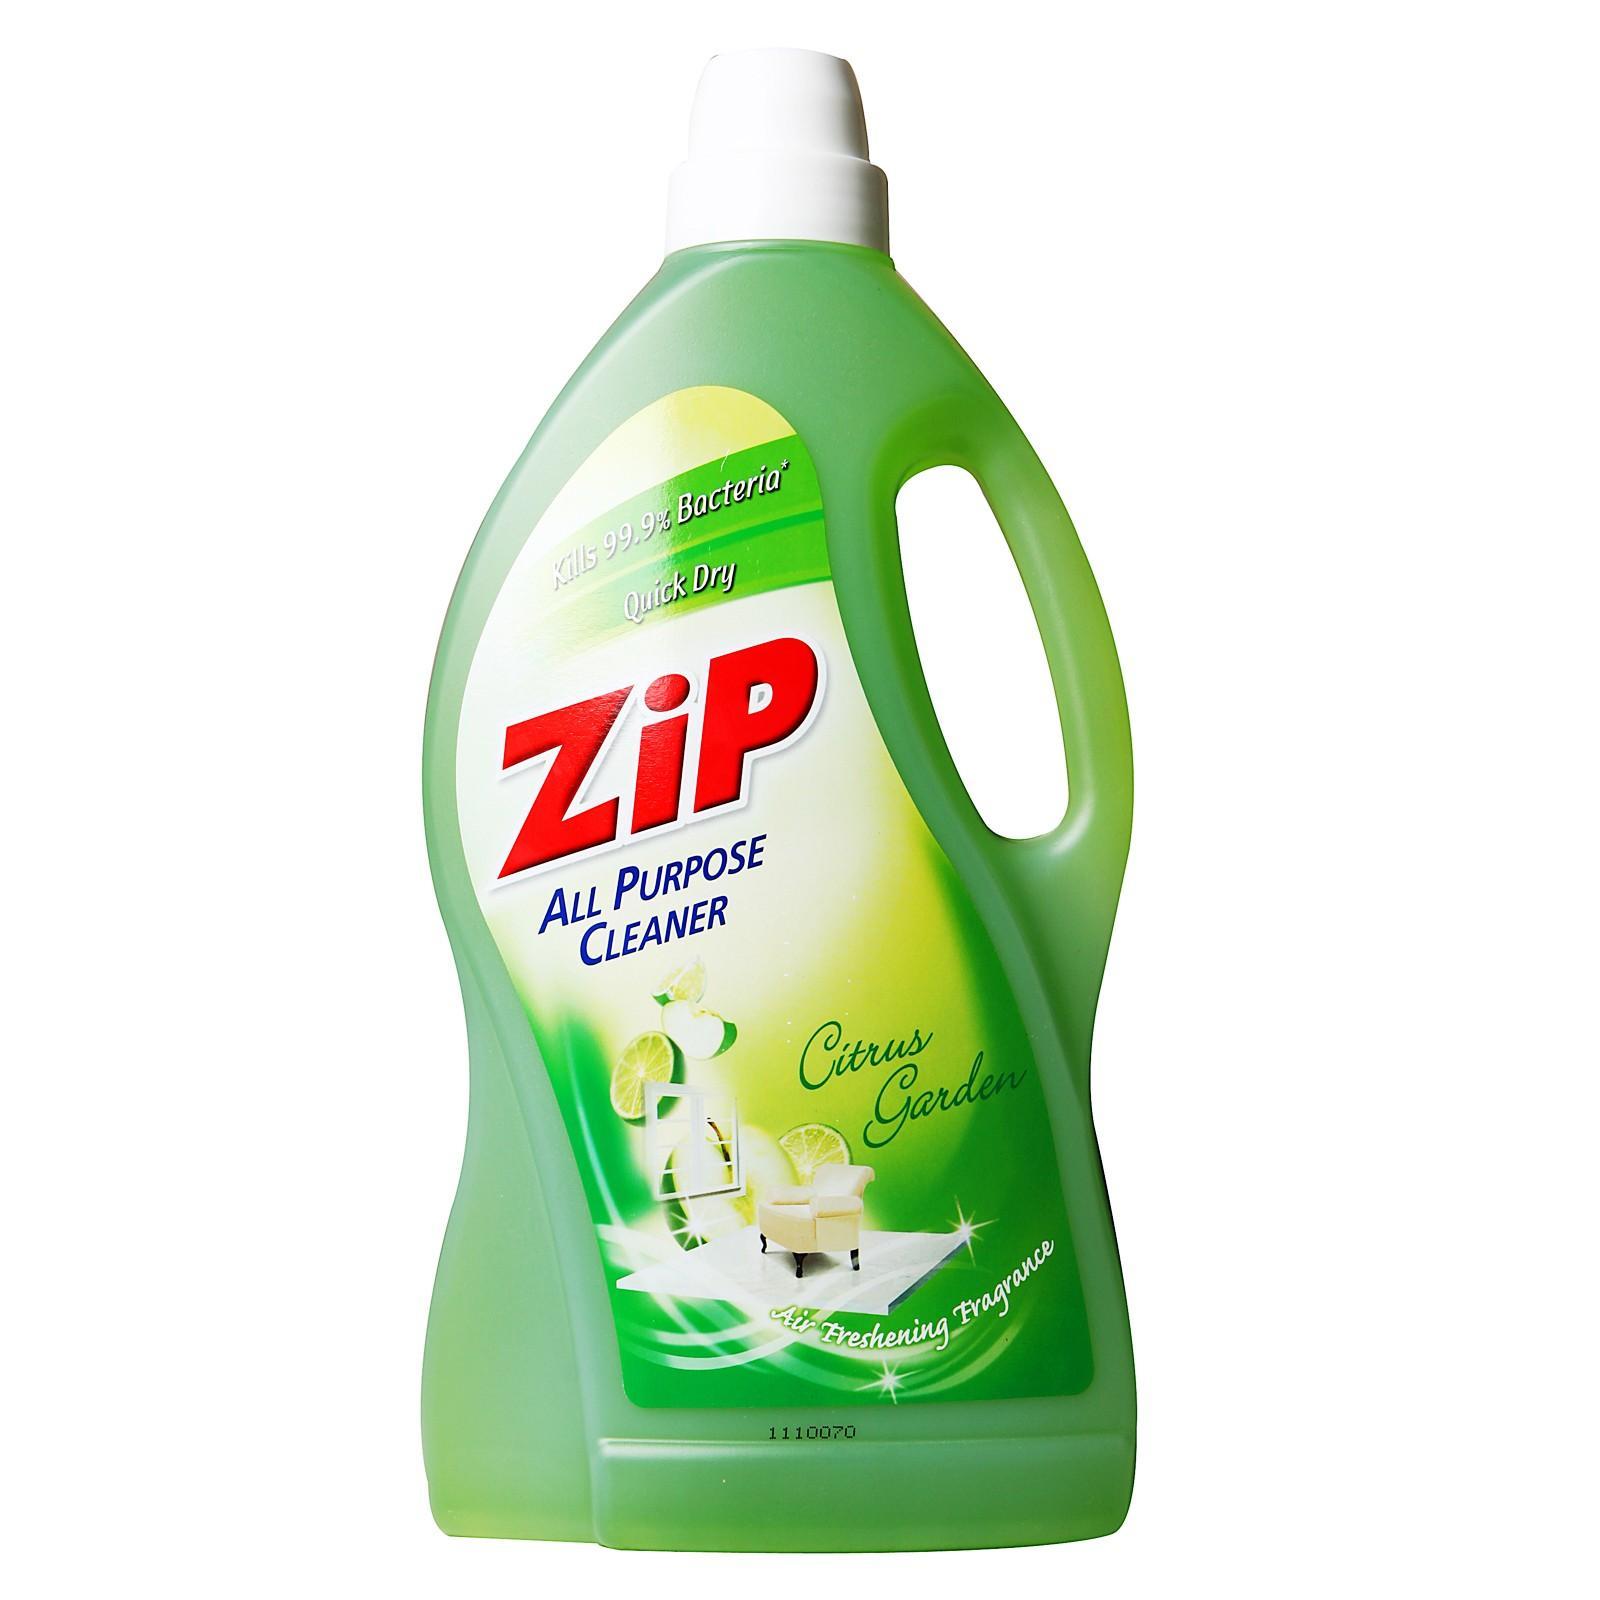 ZiP All Purpose Cleaner - Sunshine Park